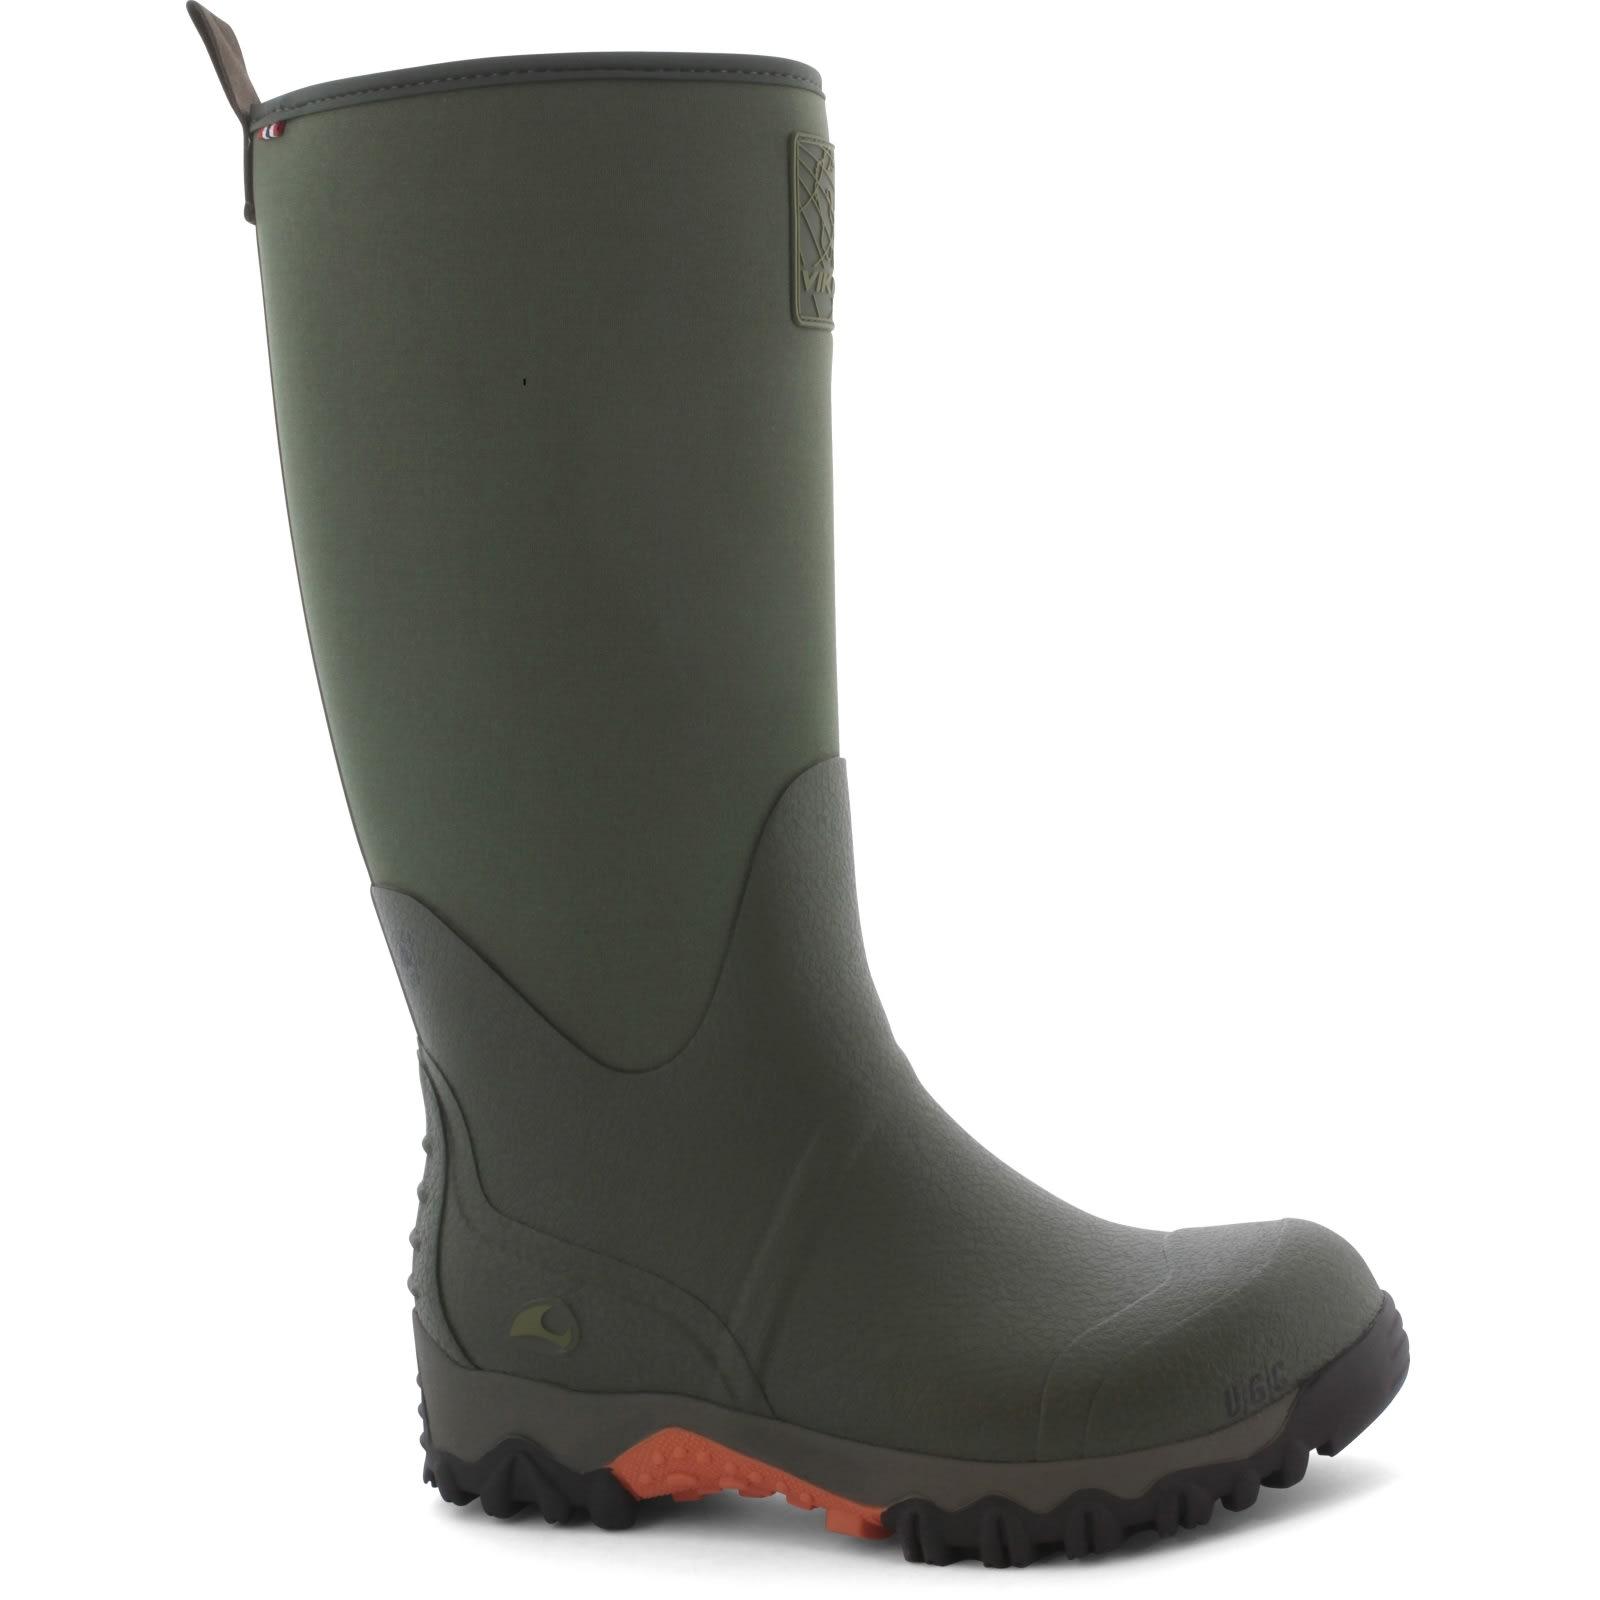 Falk Neo, Viking Footwear